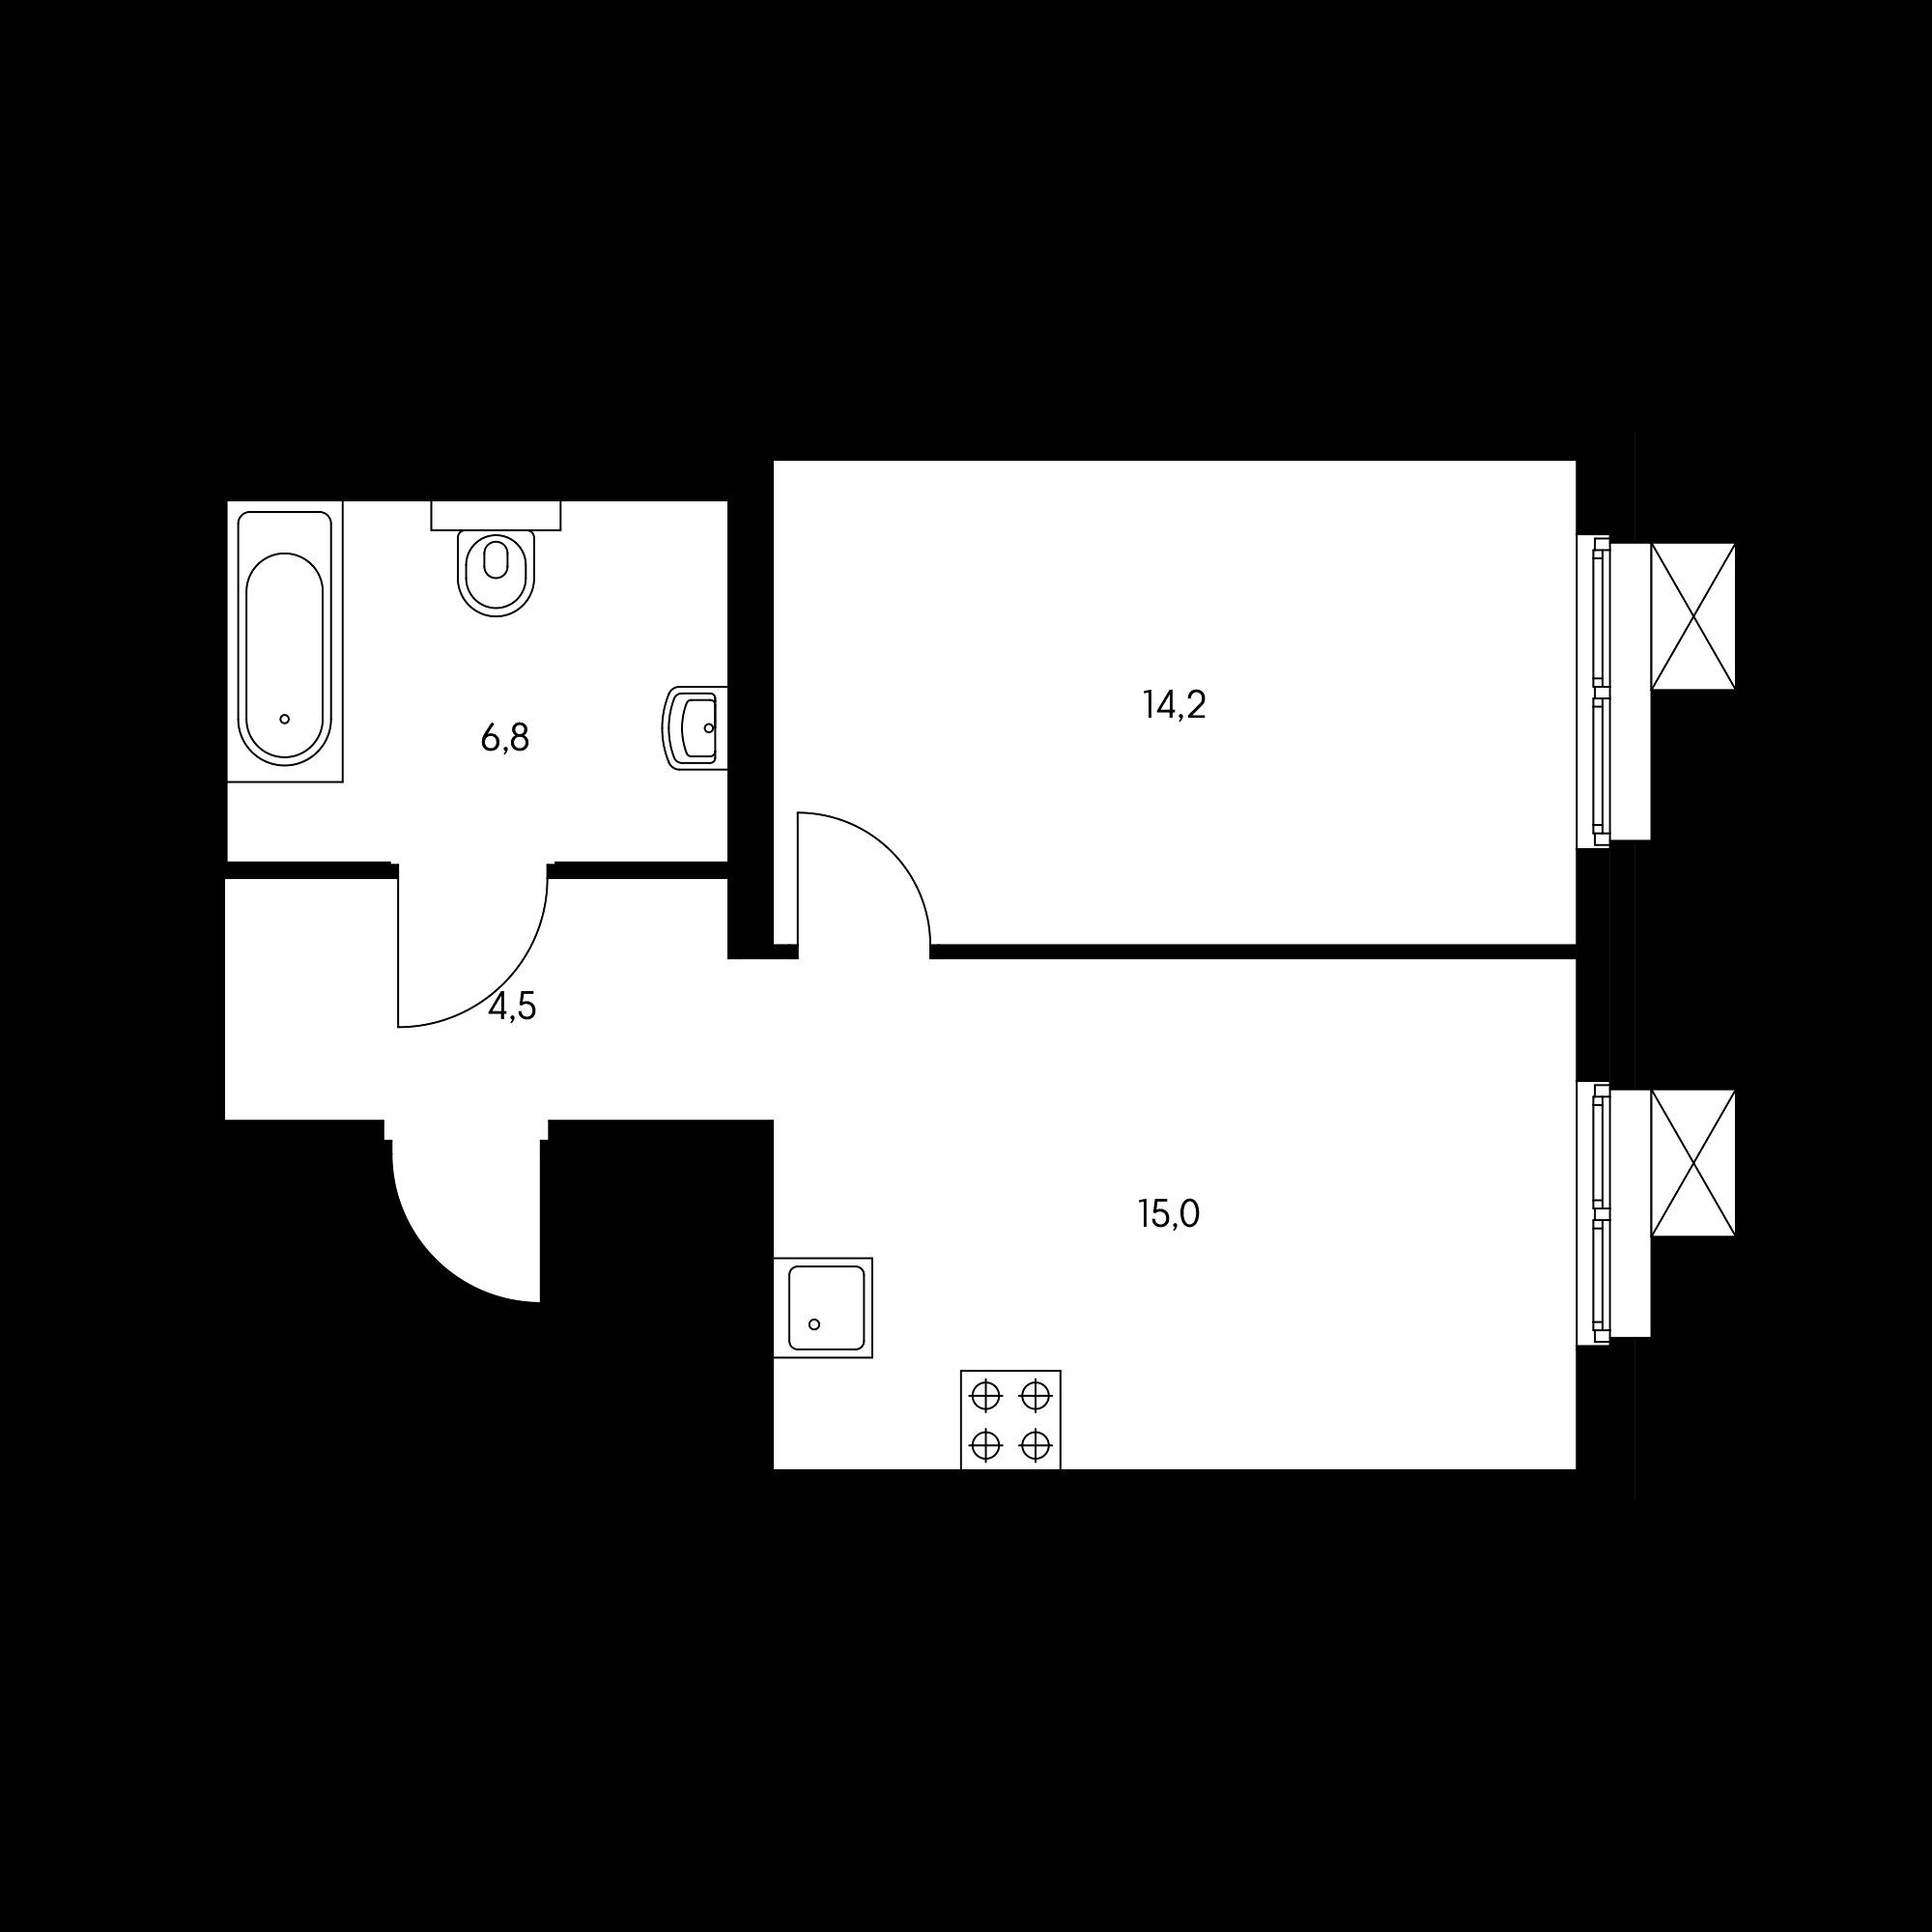 1EM21_8.4-1